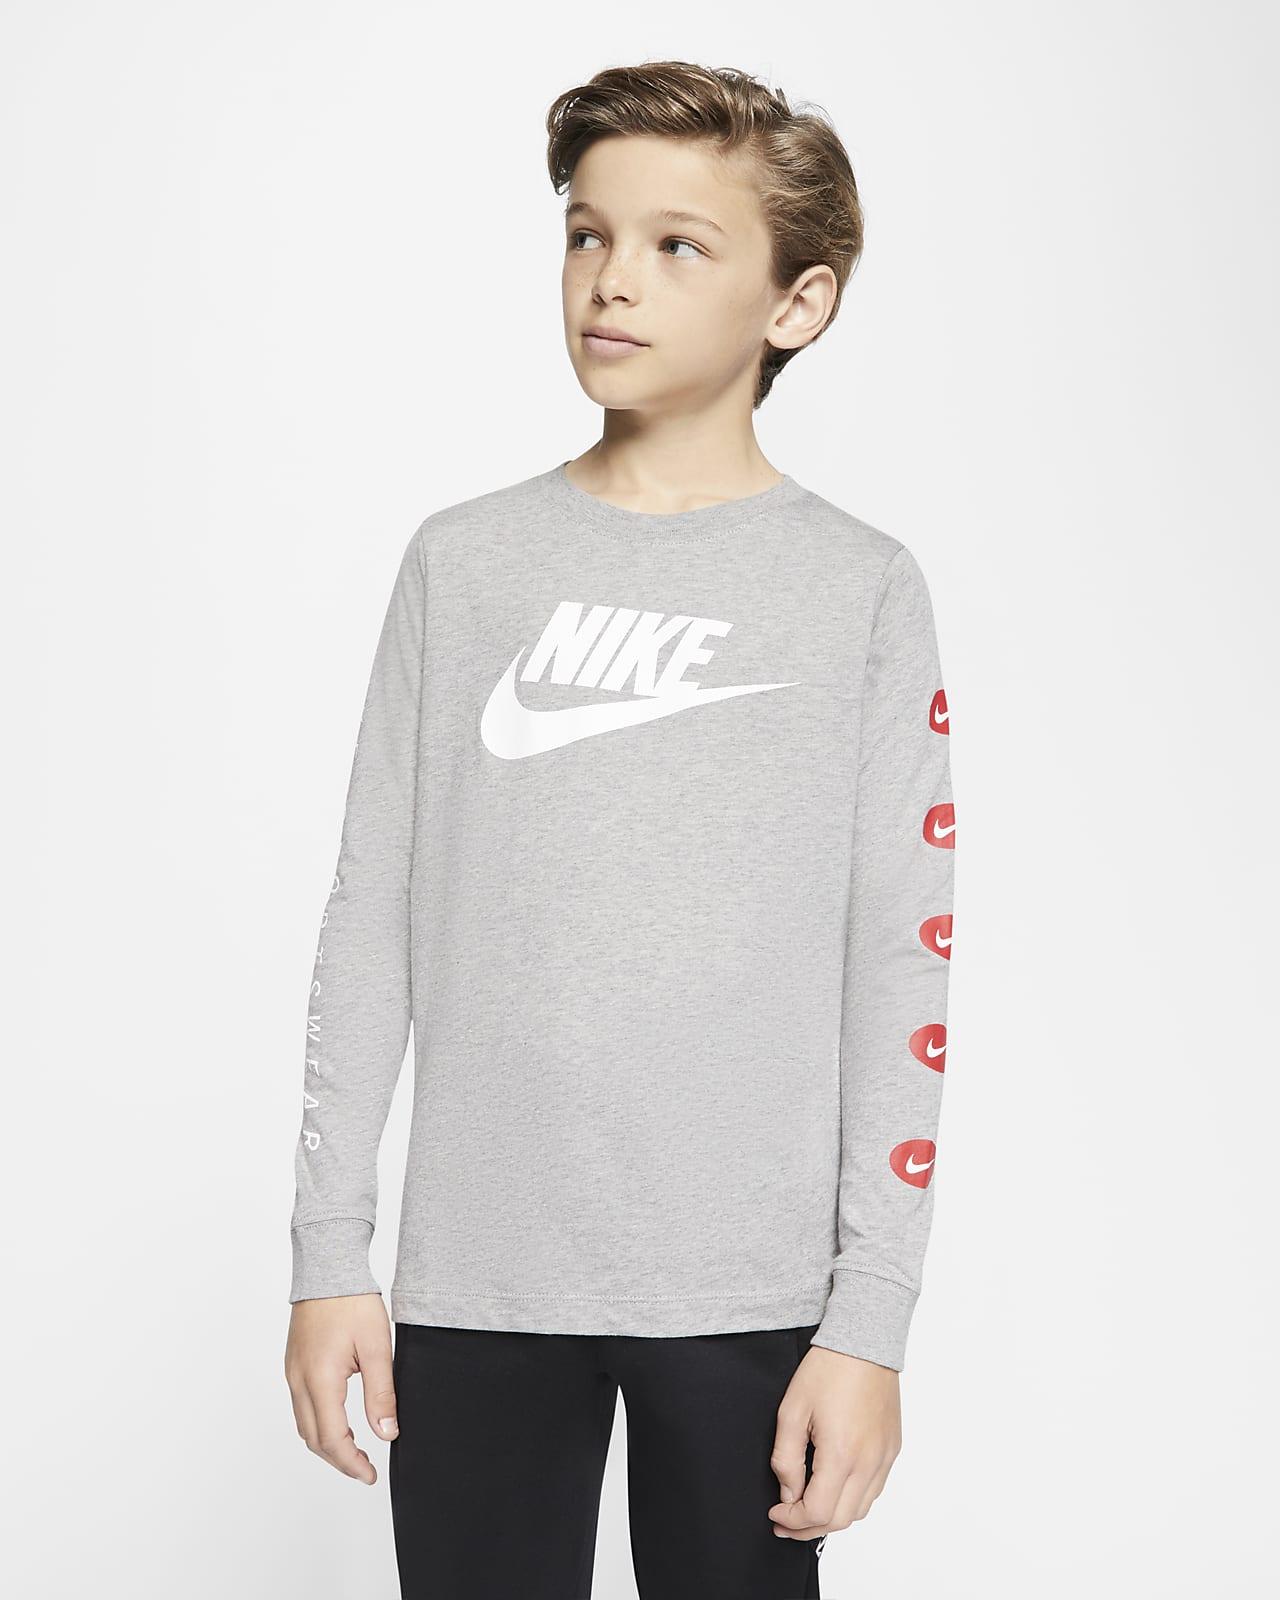 Nike Sportswear Big Kids' (Boys') Long-Sleeve T-Shirt